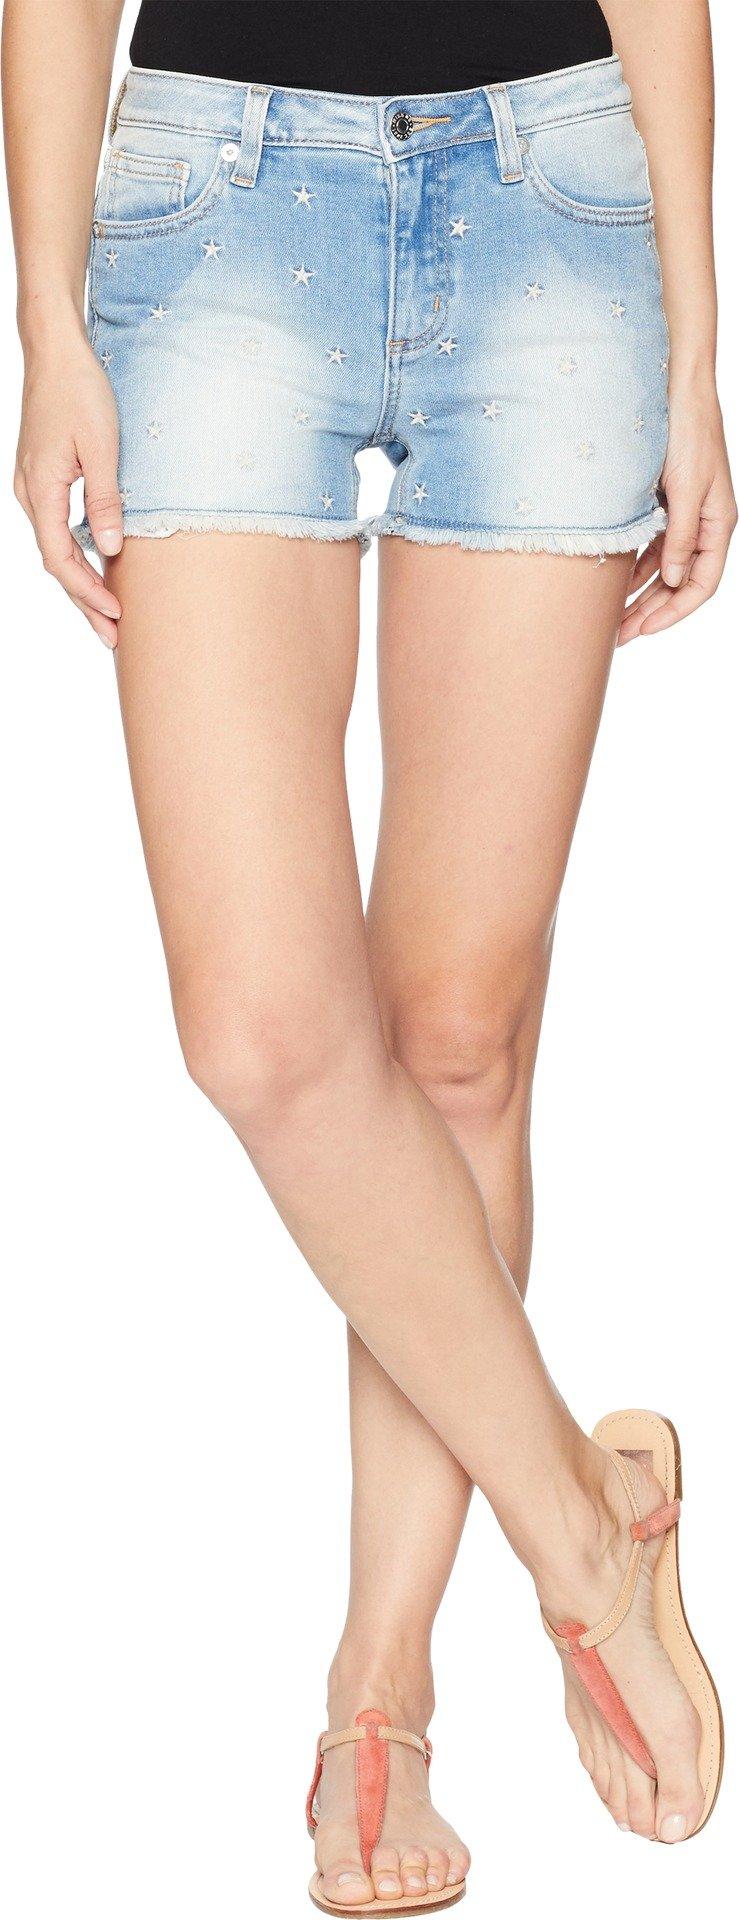 Miss Me Women's Americana Mid-Rise Denim Cutoff Shorts Blue 27